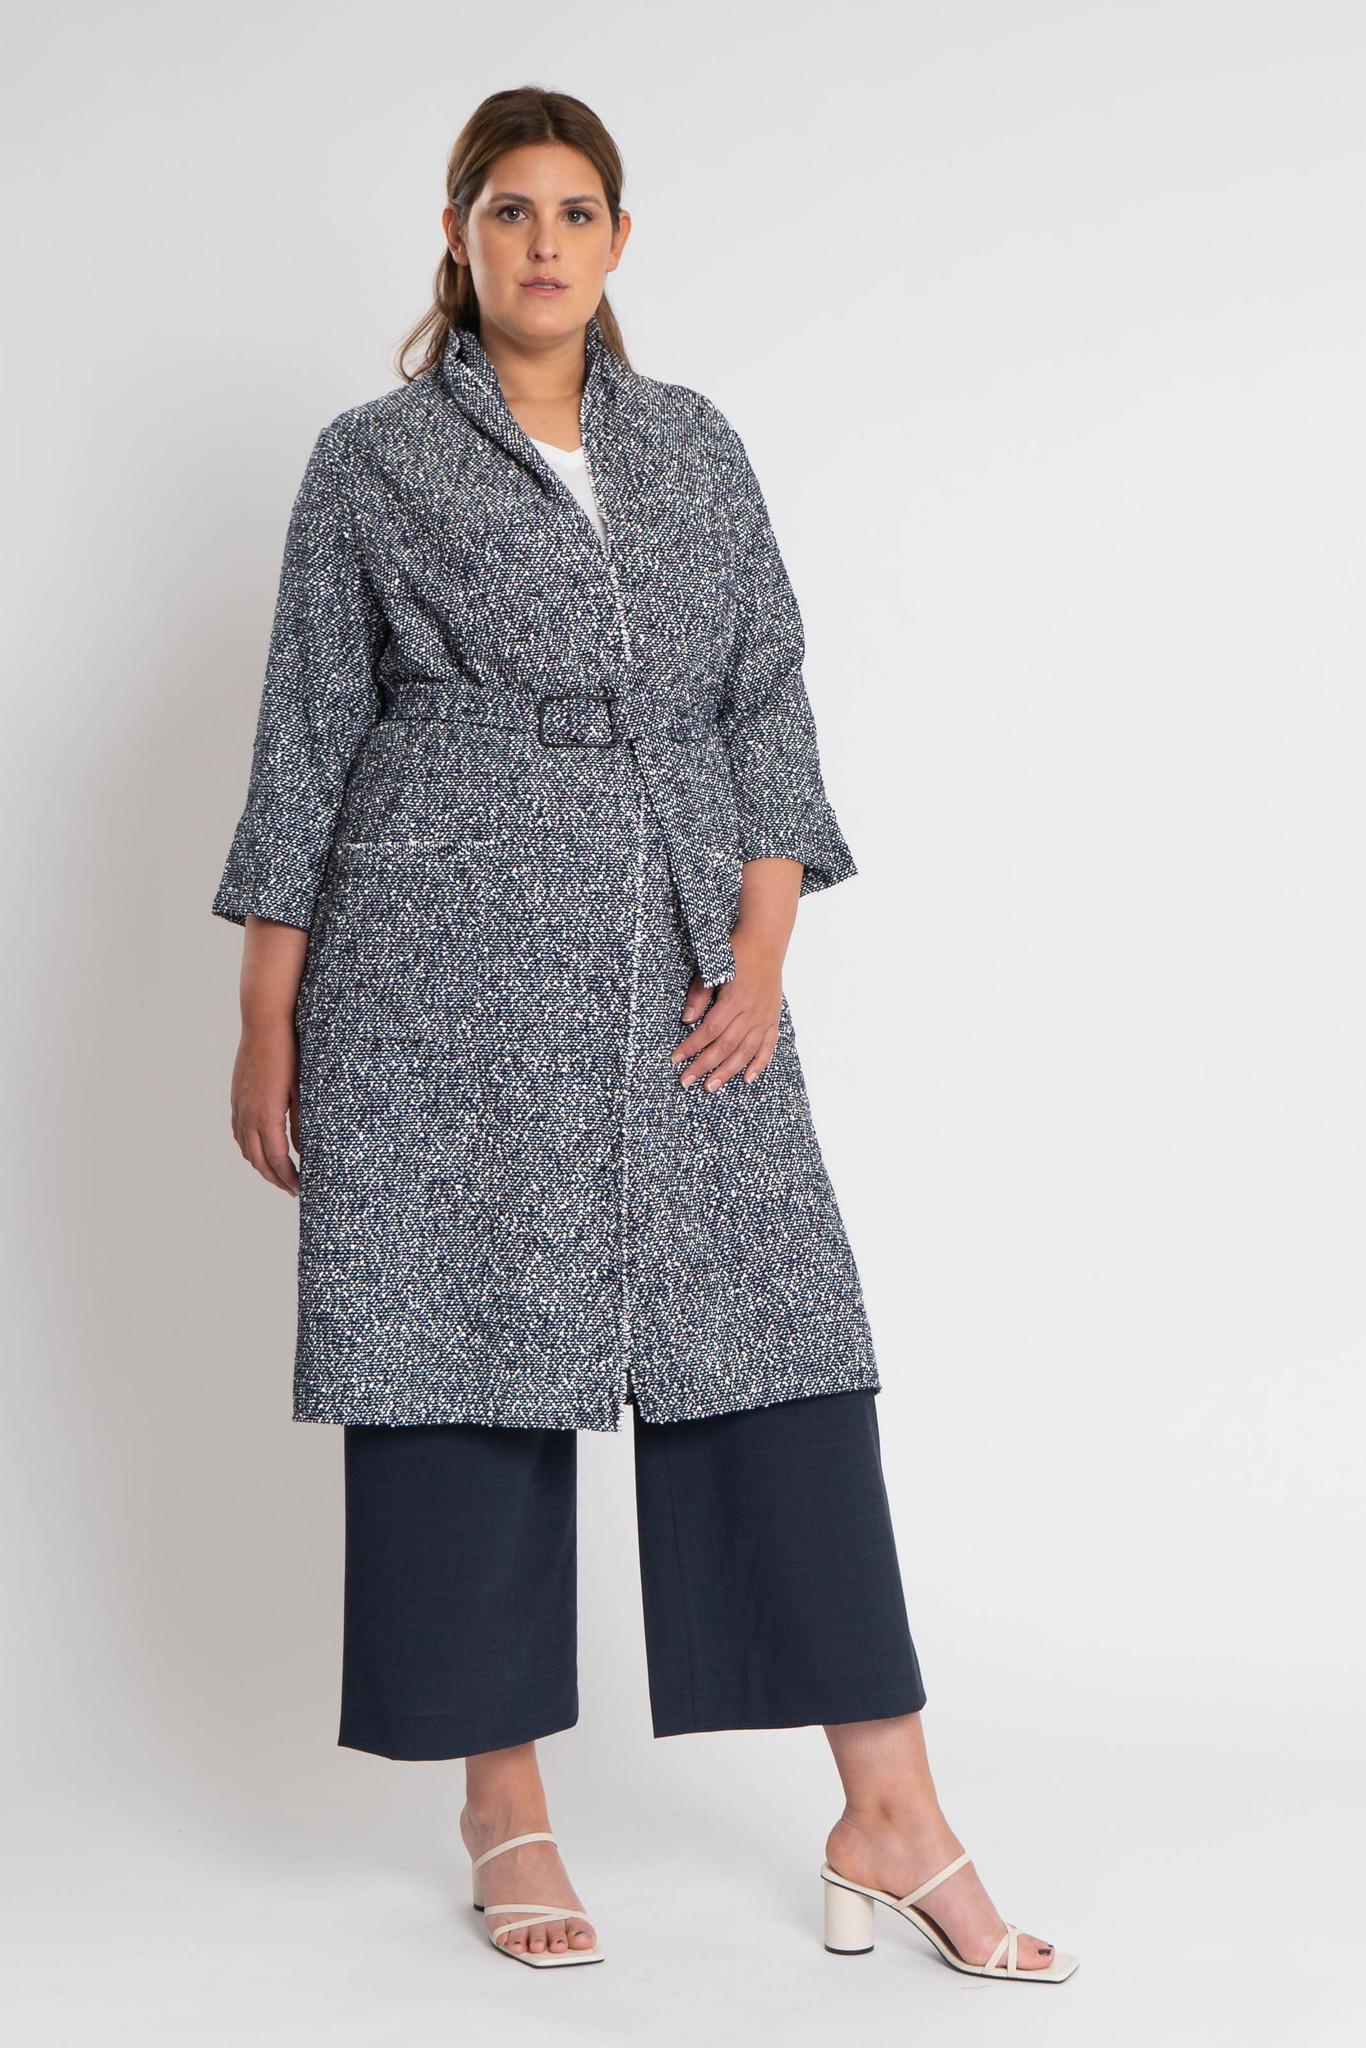 KARINA Jacket in fine Cotton-Bouclé-2